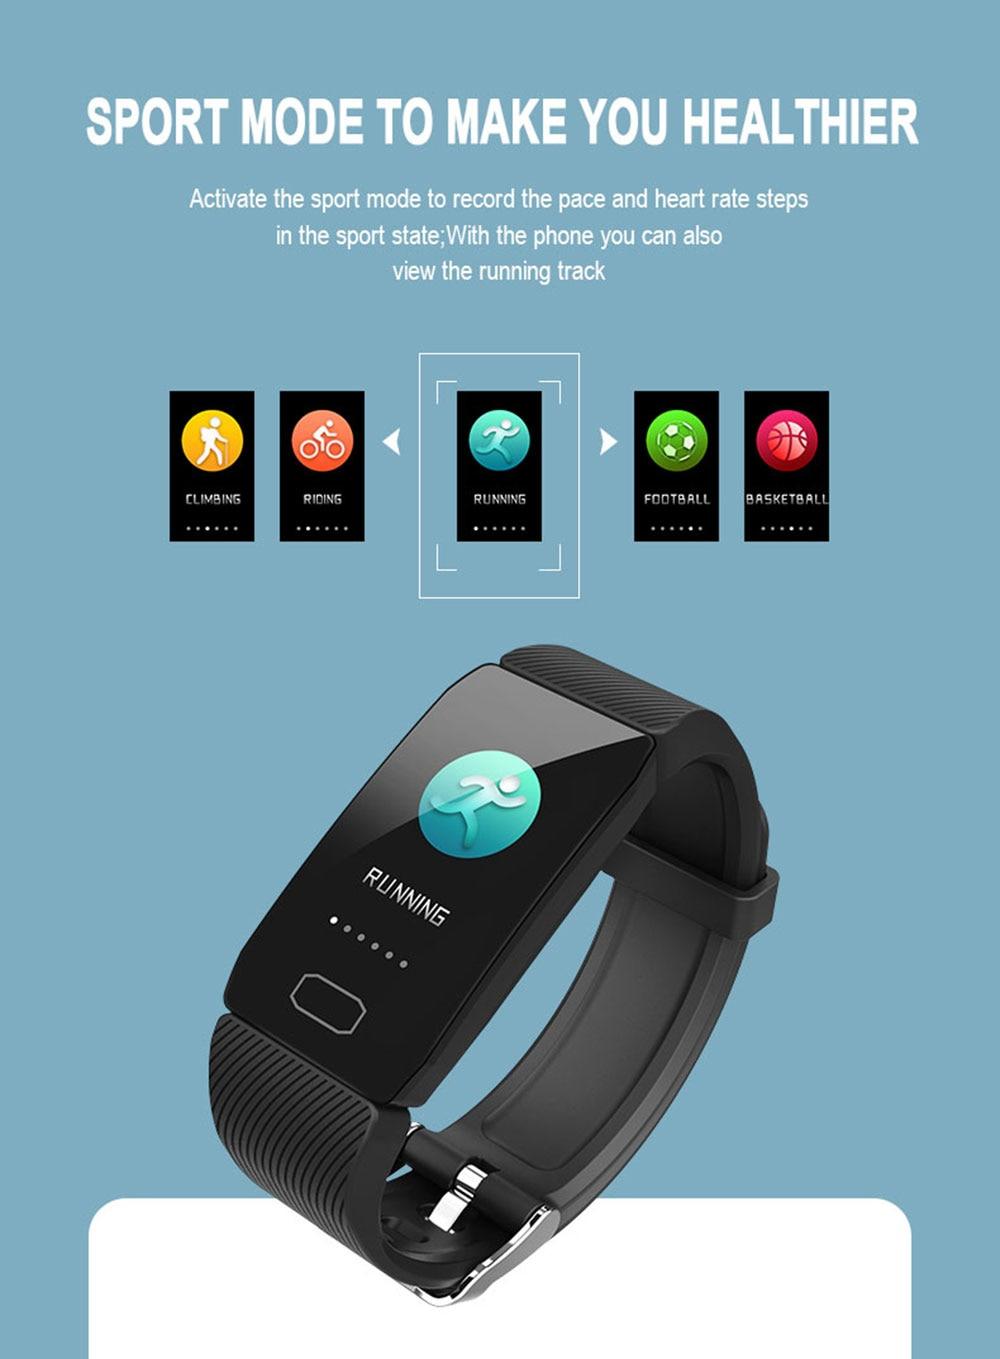 H3a42318b2e63411c9f55eb92a83f4eedf Fitness Bracelet Blood Pressure 1.14'' Screen Fitness Tracker Smart Watch Waterproof Smart Wristband Weather Display Women Men